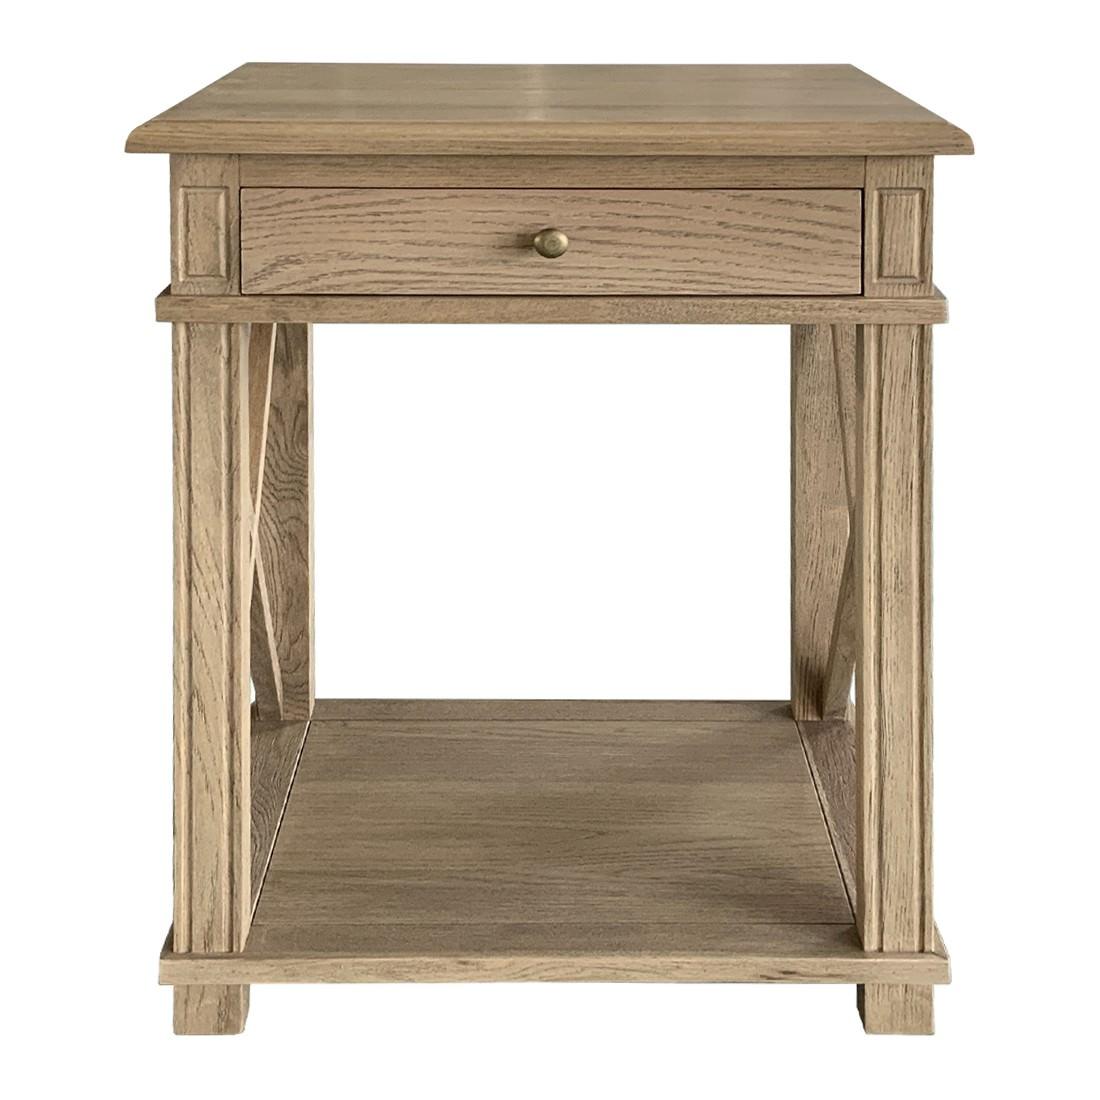 Phyllis Oak Timber Side Table, Large, Weathered Oak